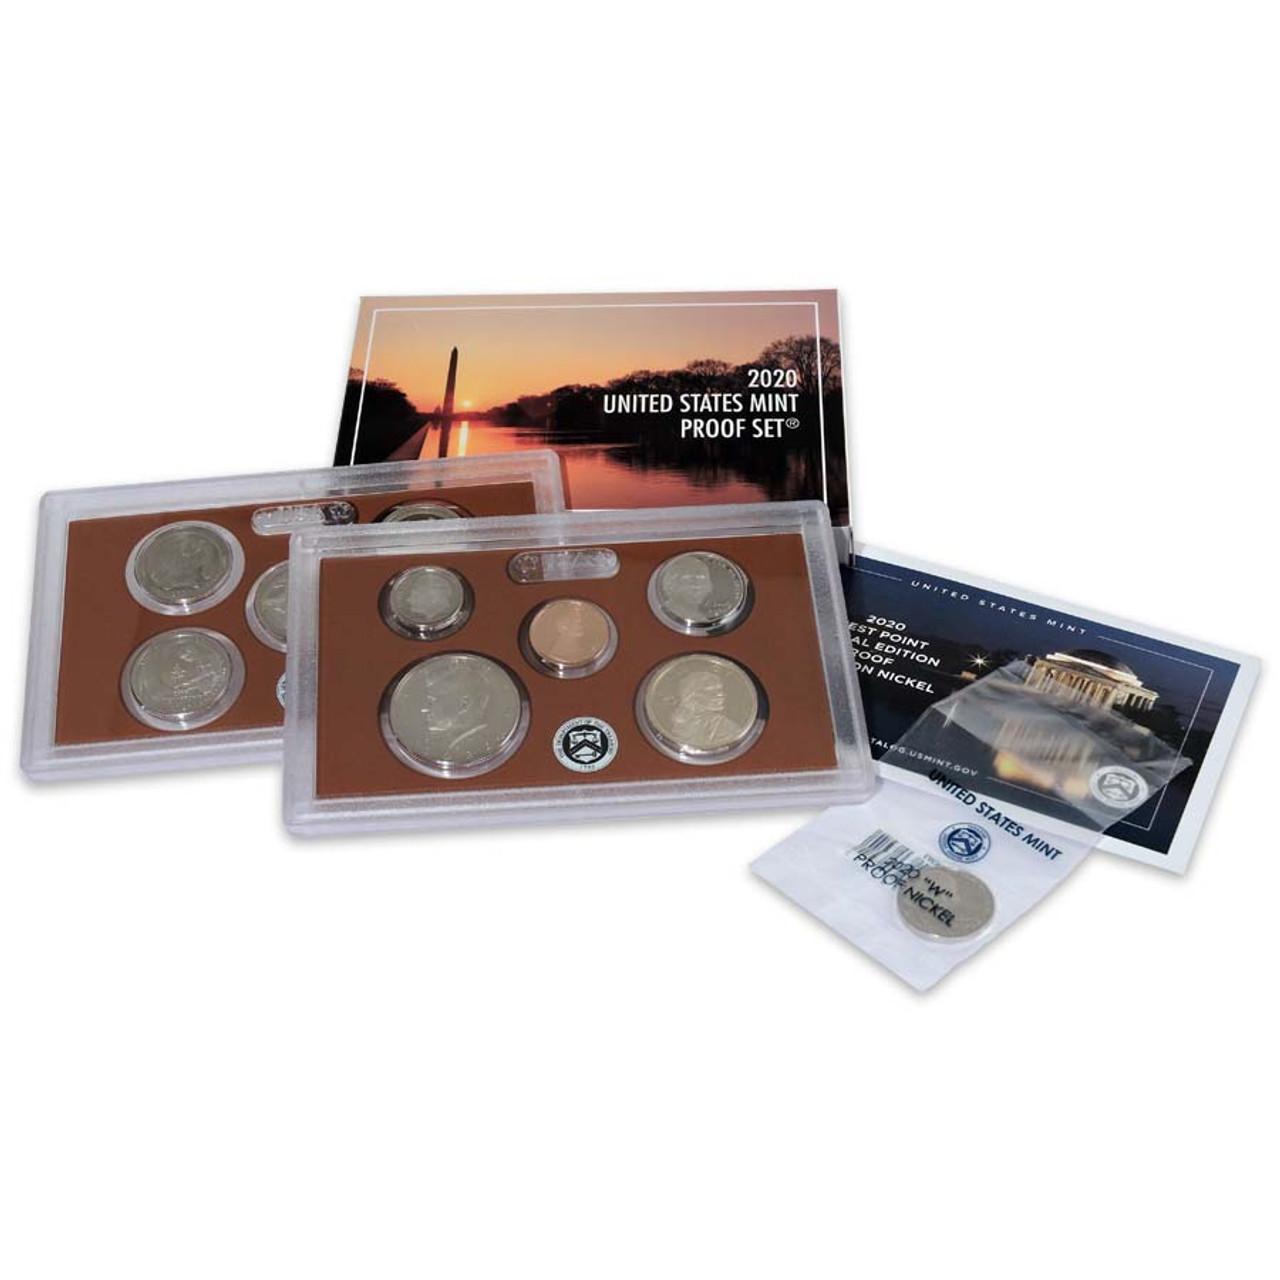 2020 Proof Set 10 Coins Image 1